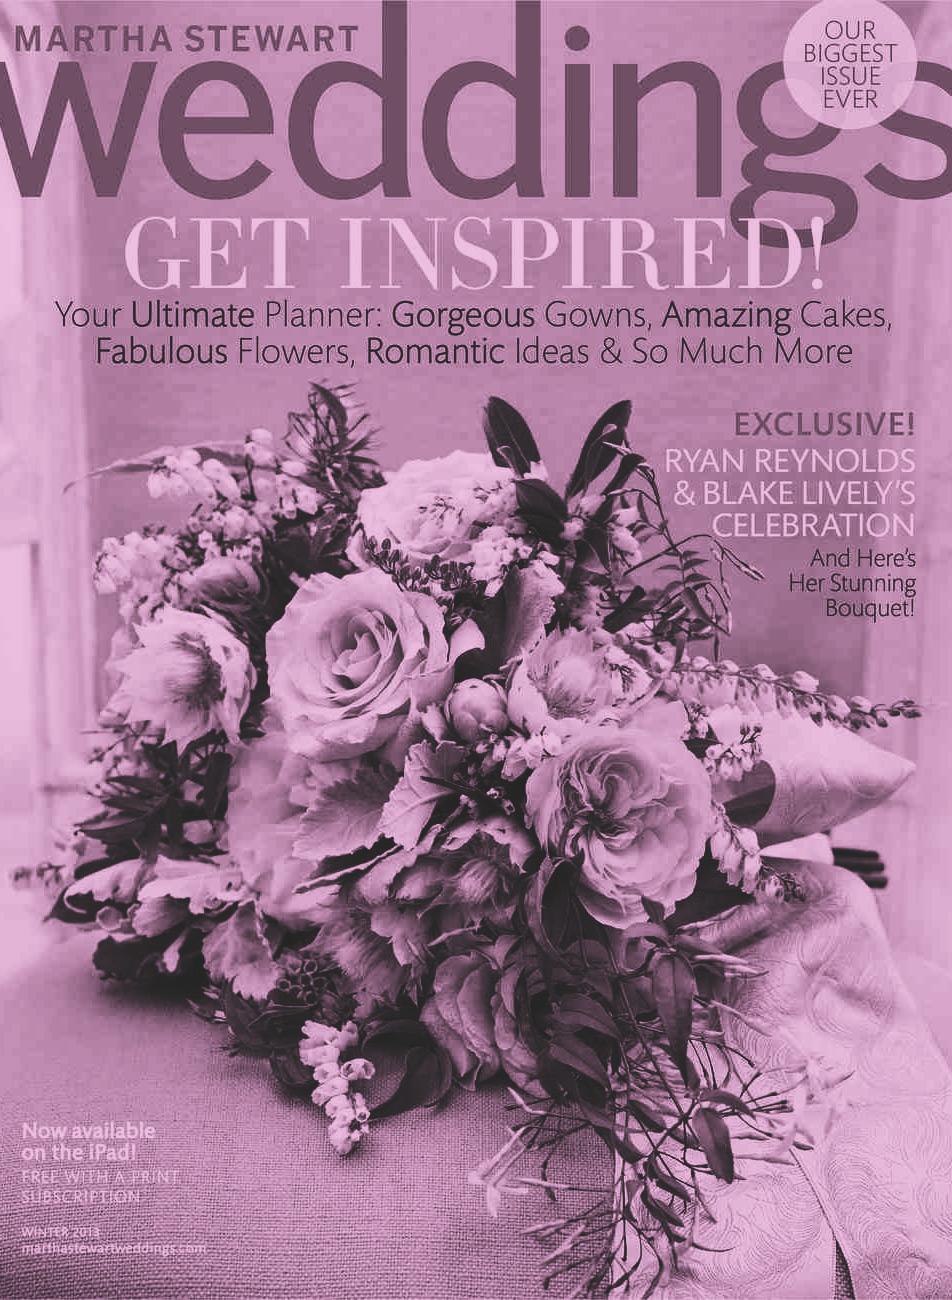 Martha Stewart Weddings - November Issue 2014